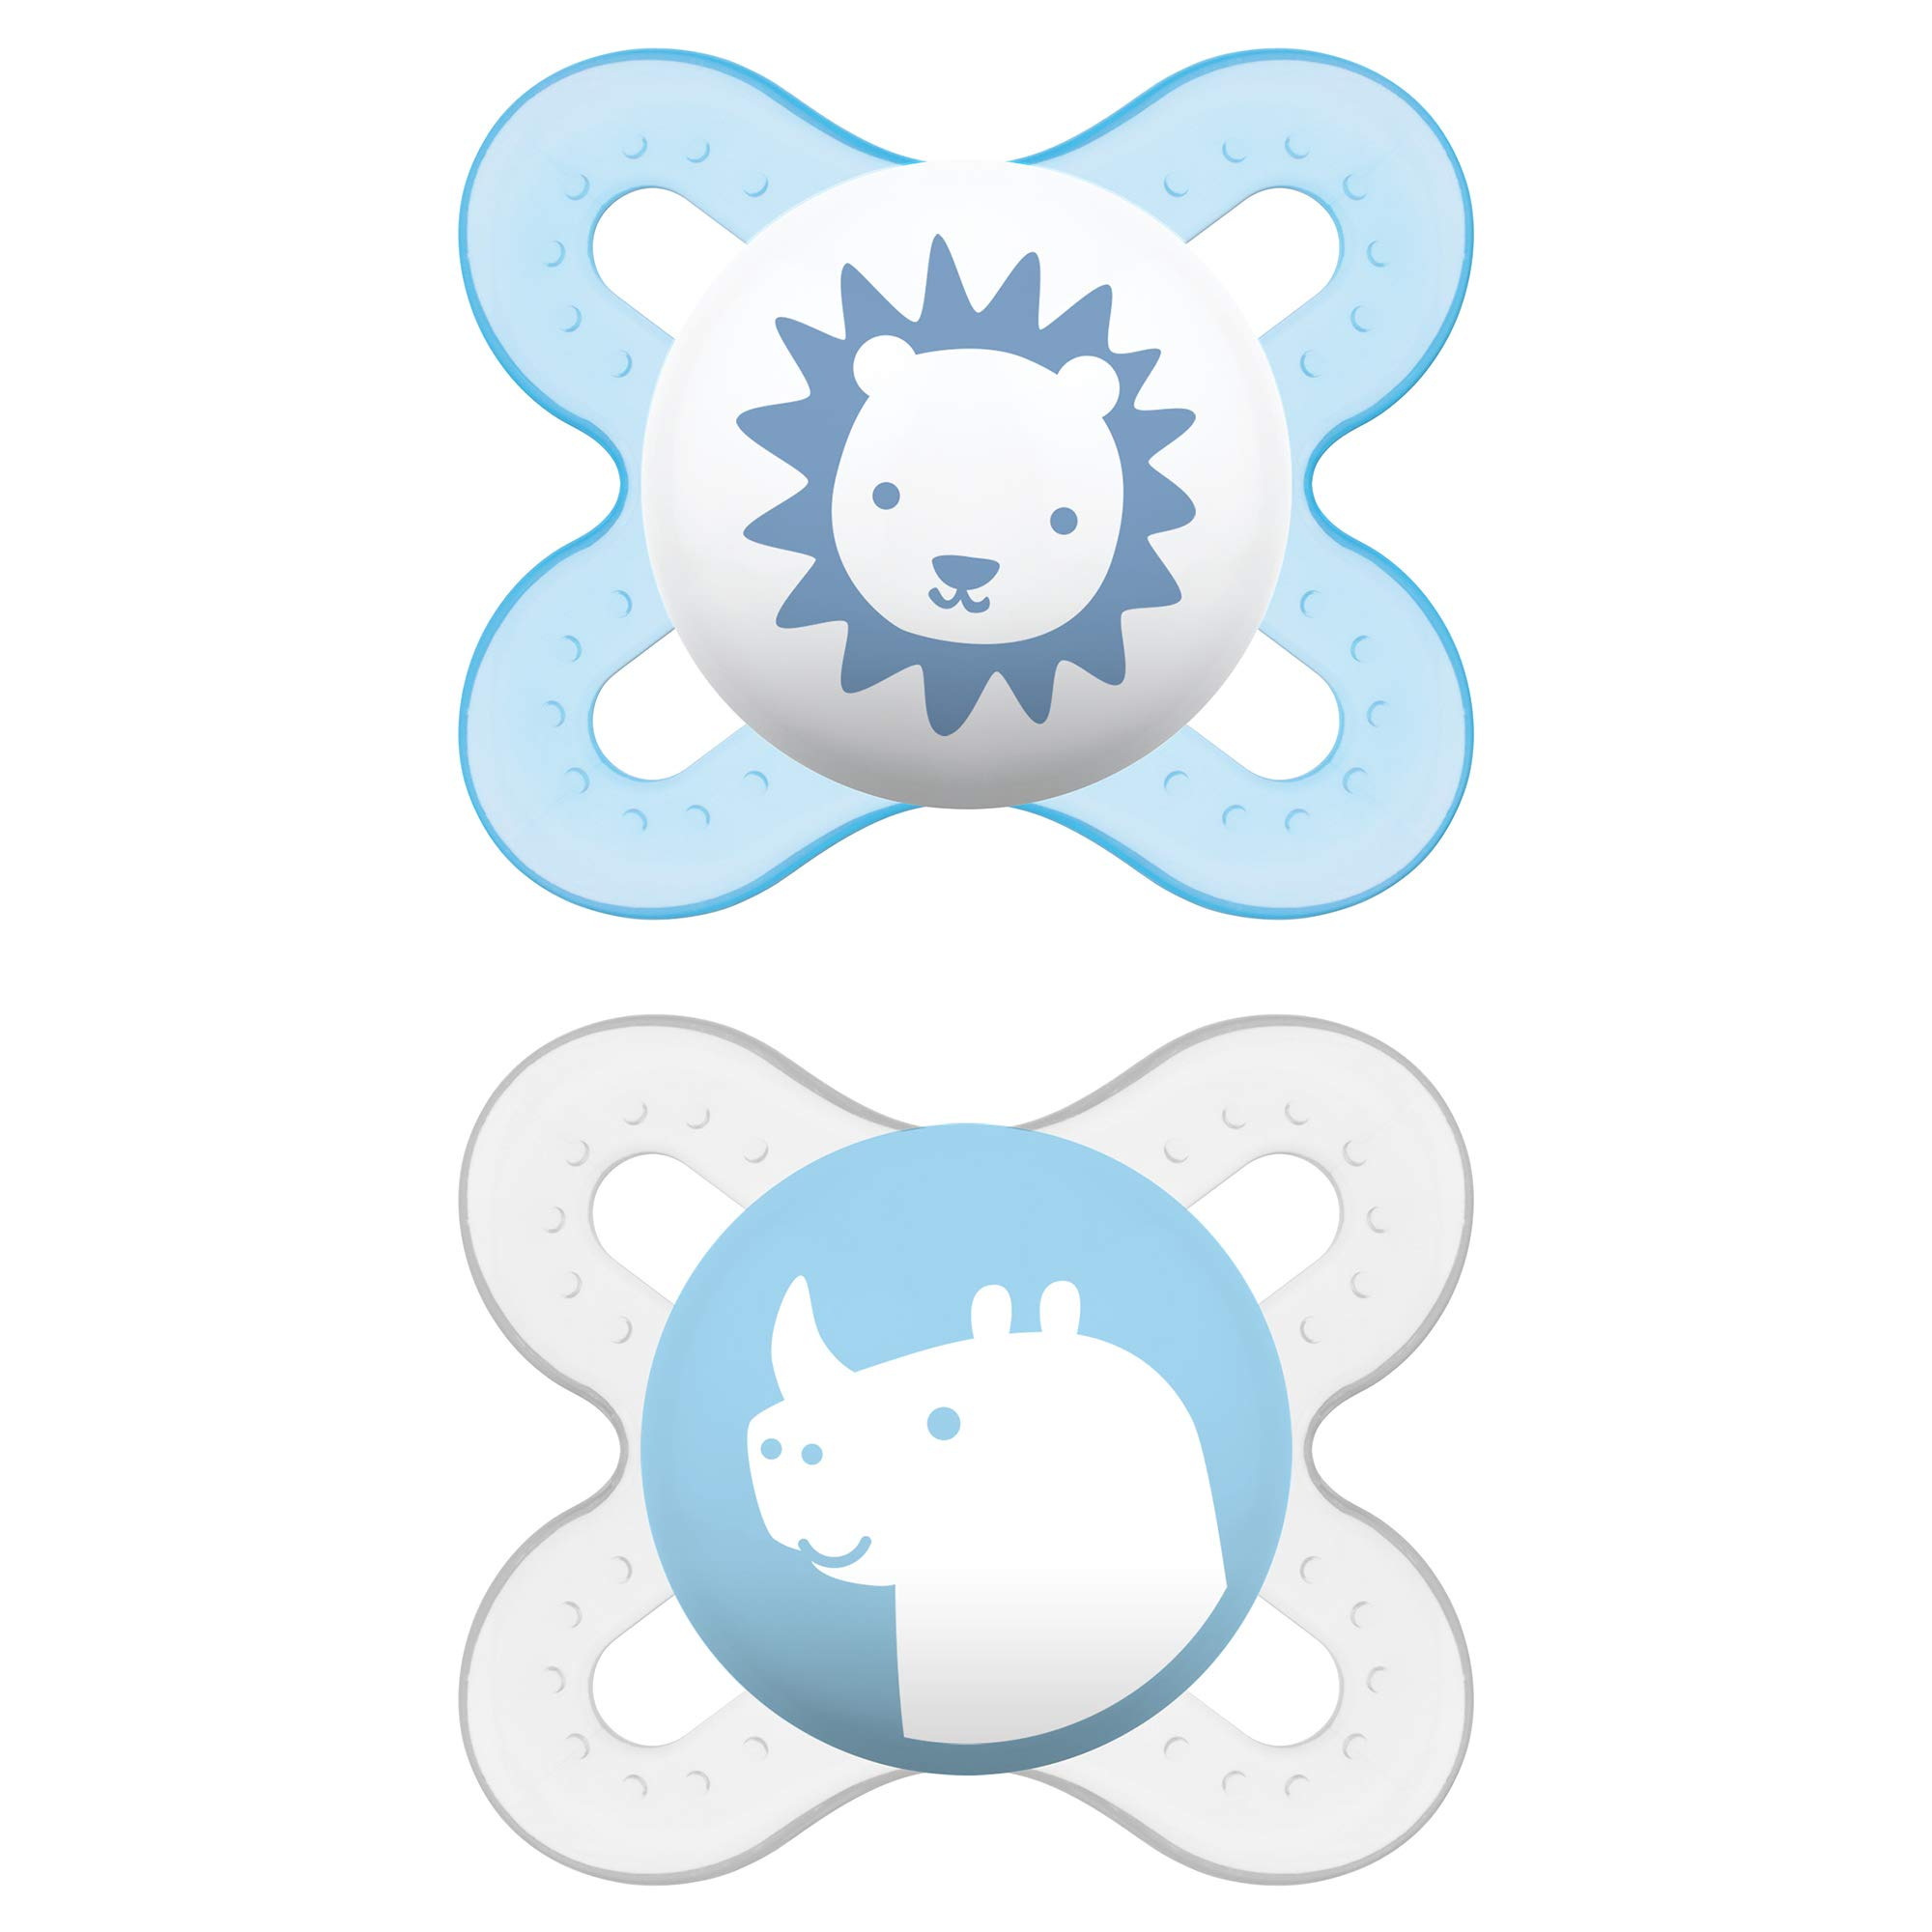 MAM Start Newborn Pacifiers (2 pack, 1 Sterilizing Pacifier Case), Newborn Baby Boy Pacifiers, Best Pacifier for…